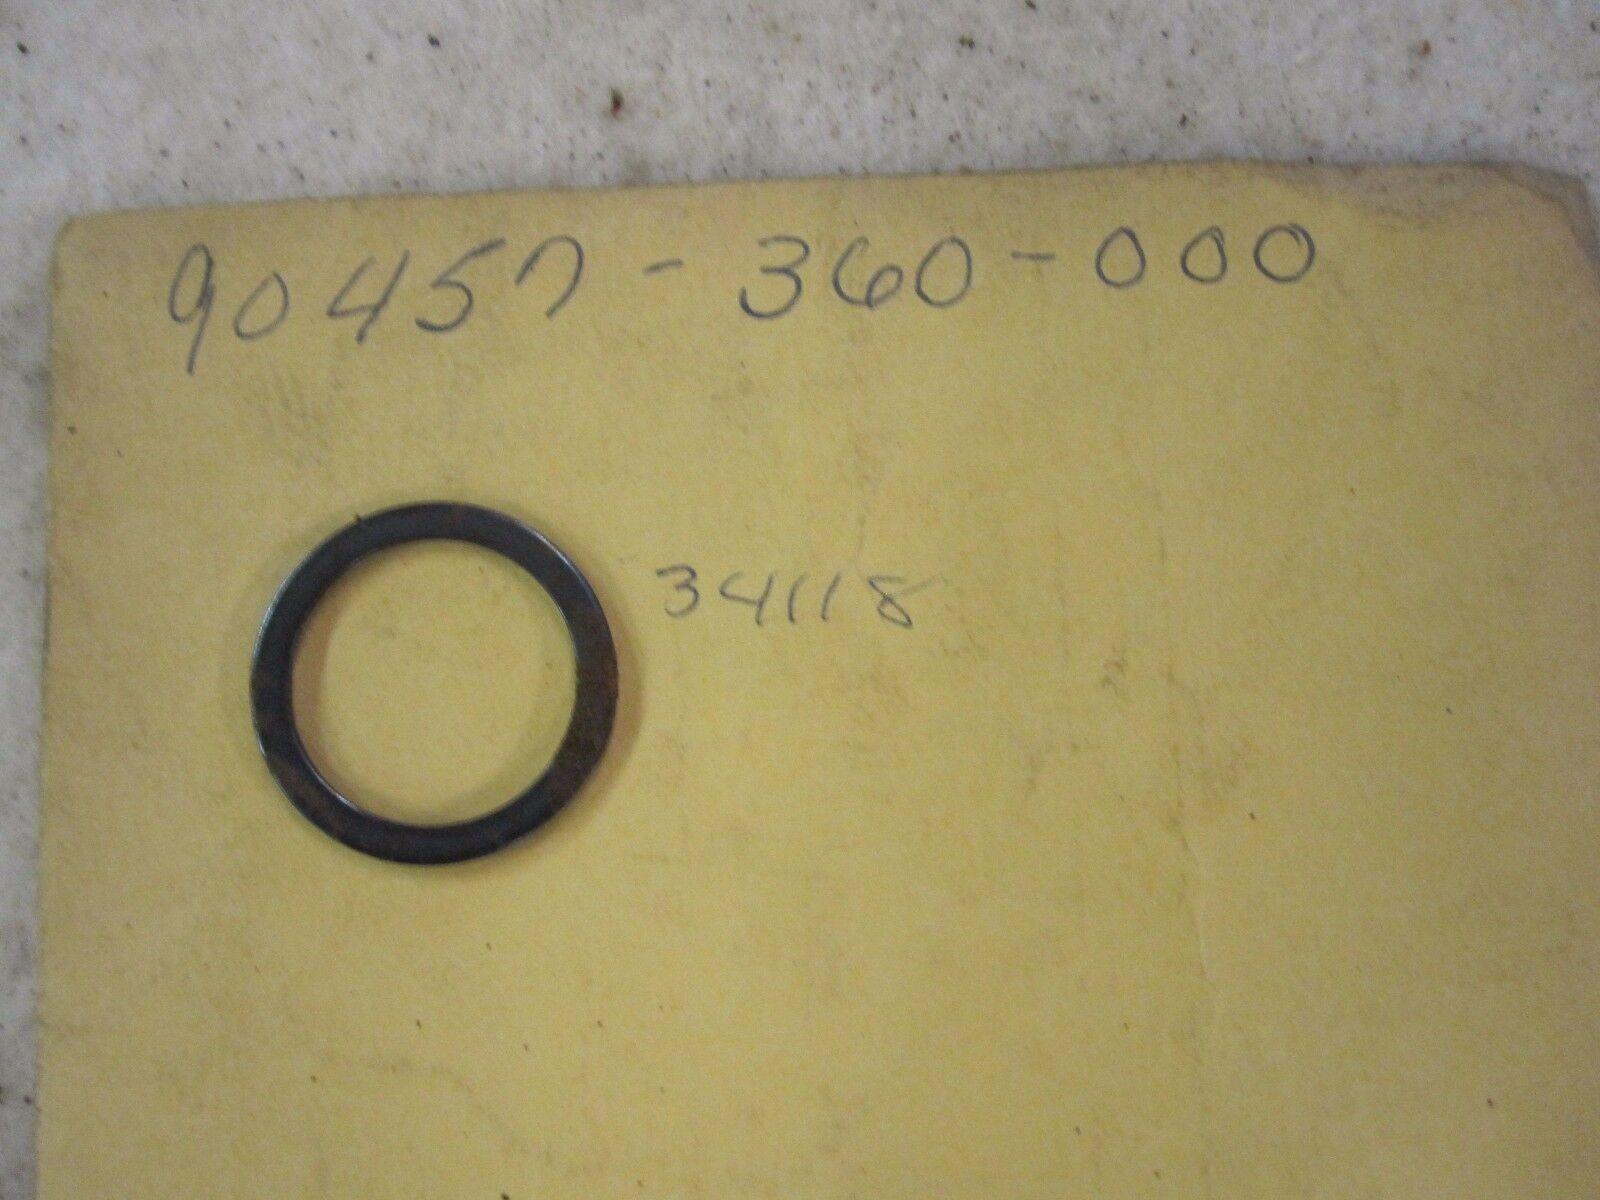 NOS Honda 74 75 76 77 78 MT125 CR125 MR175 CR125 Thrust Washer 90457-360-000